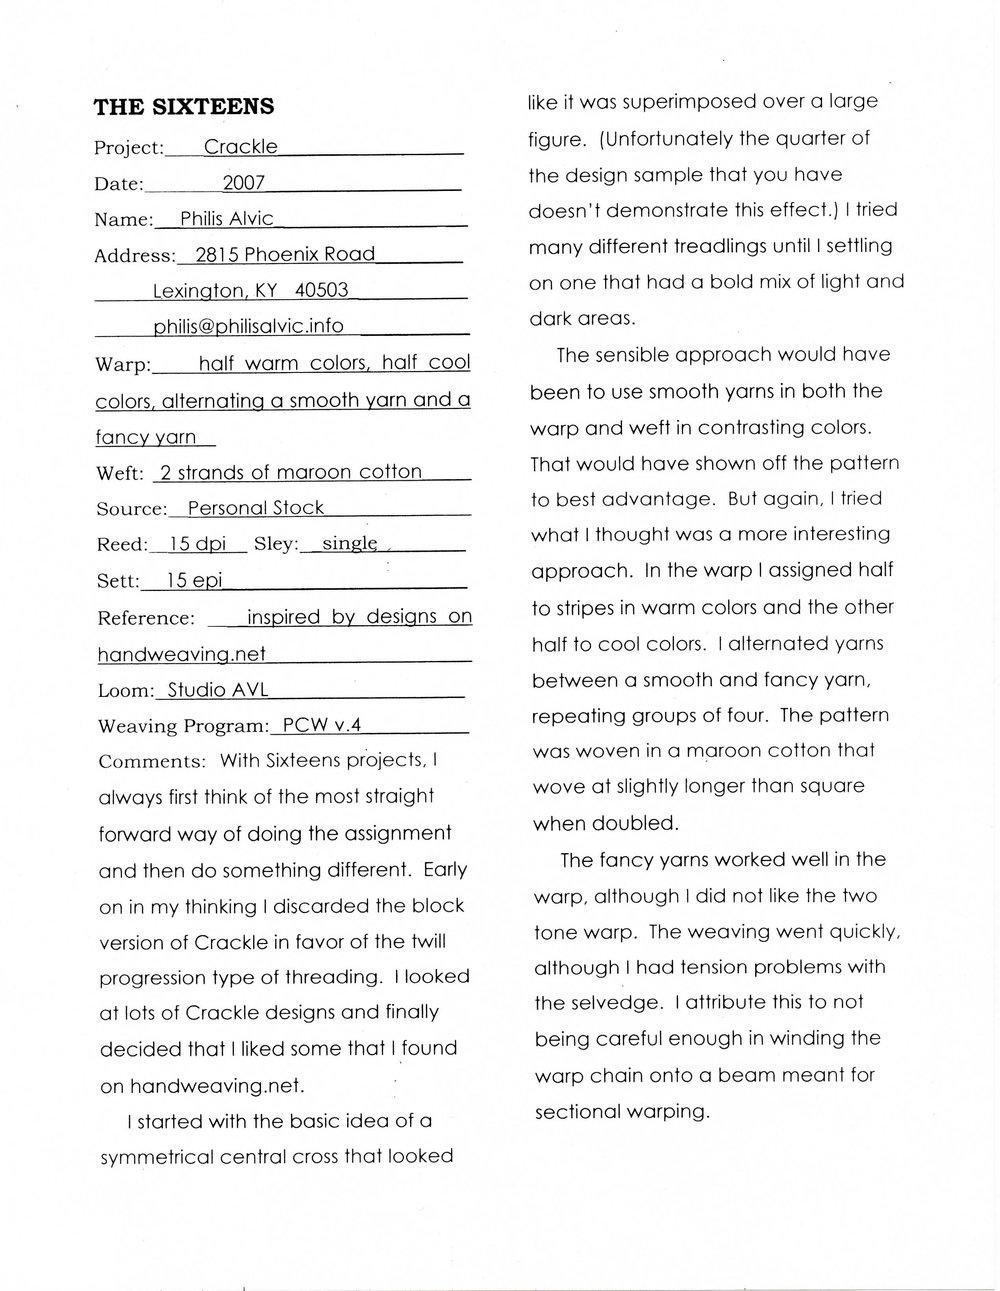 2007_Page_1_Image_0001.jpg